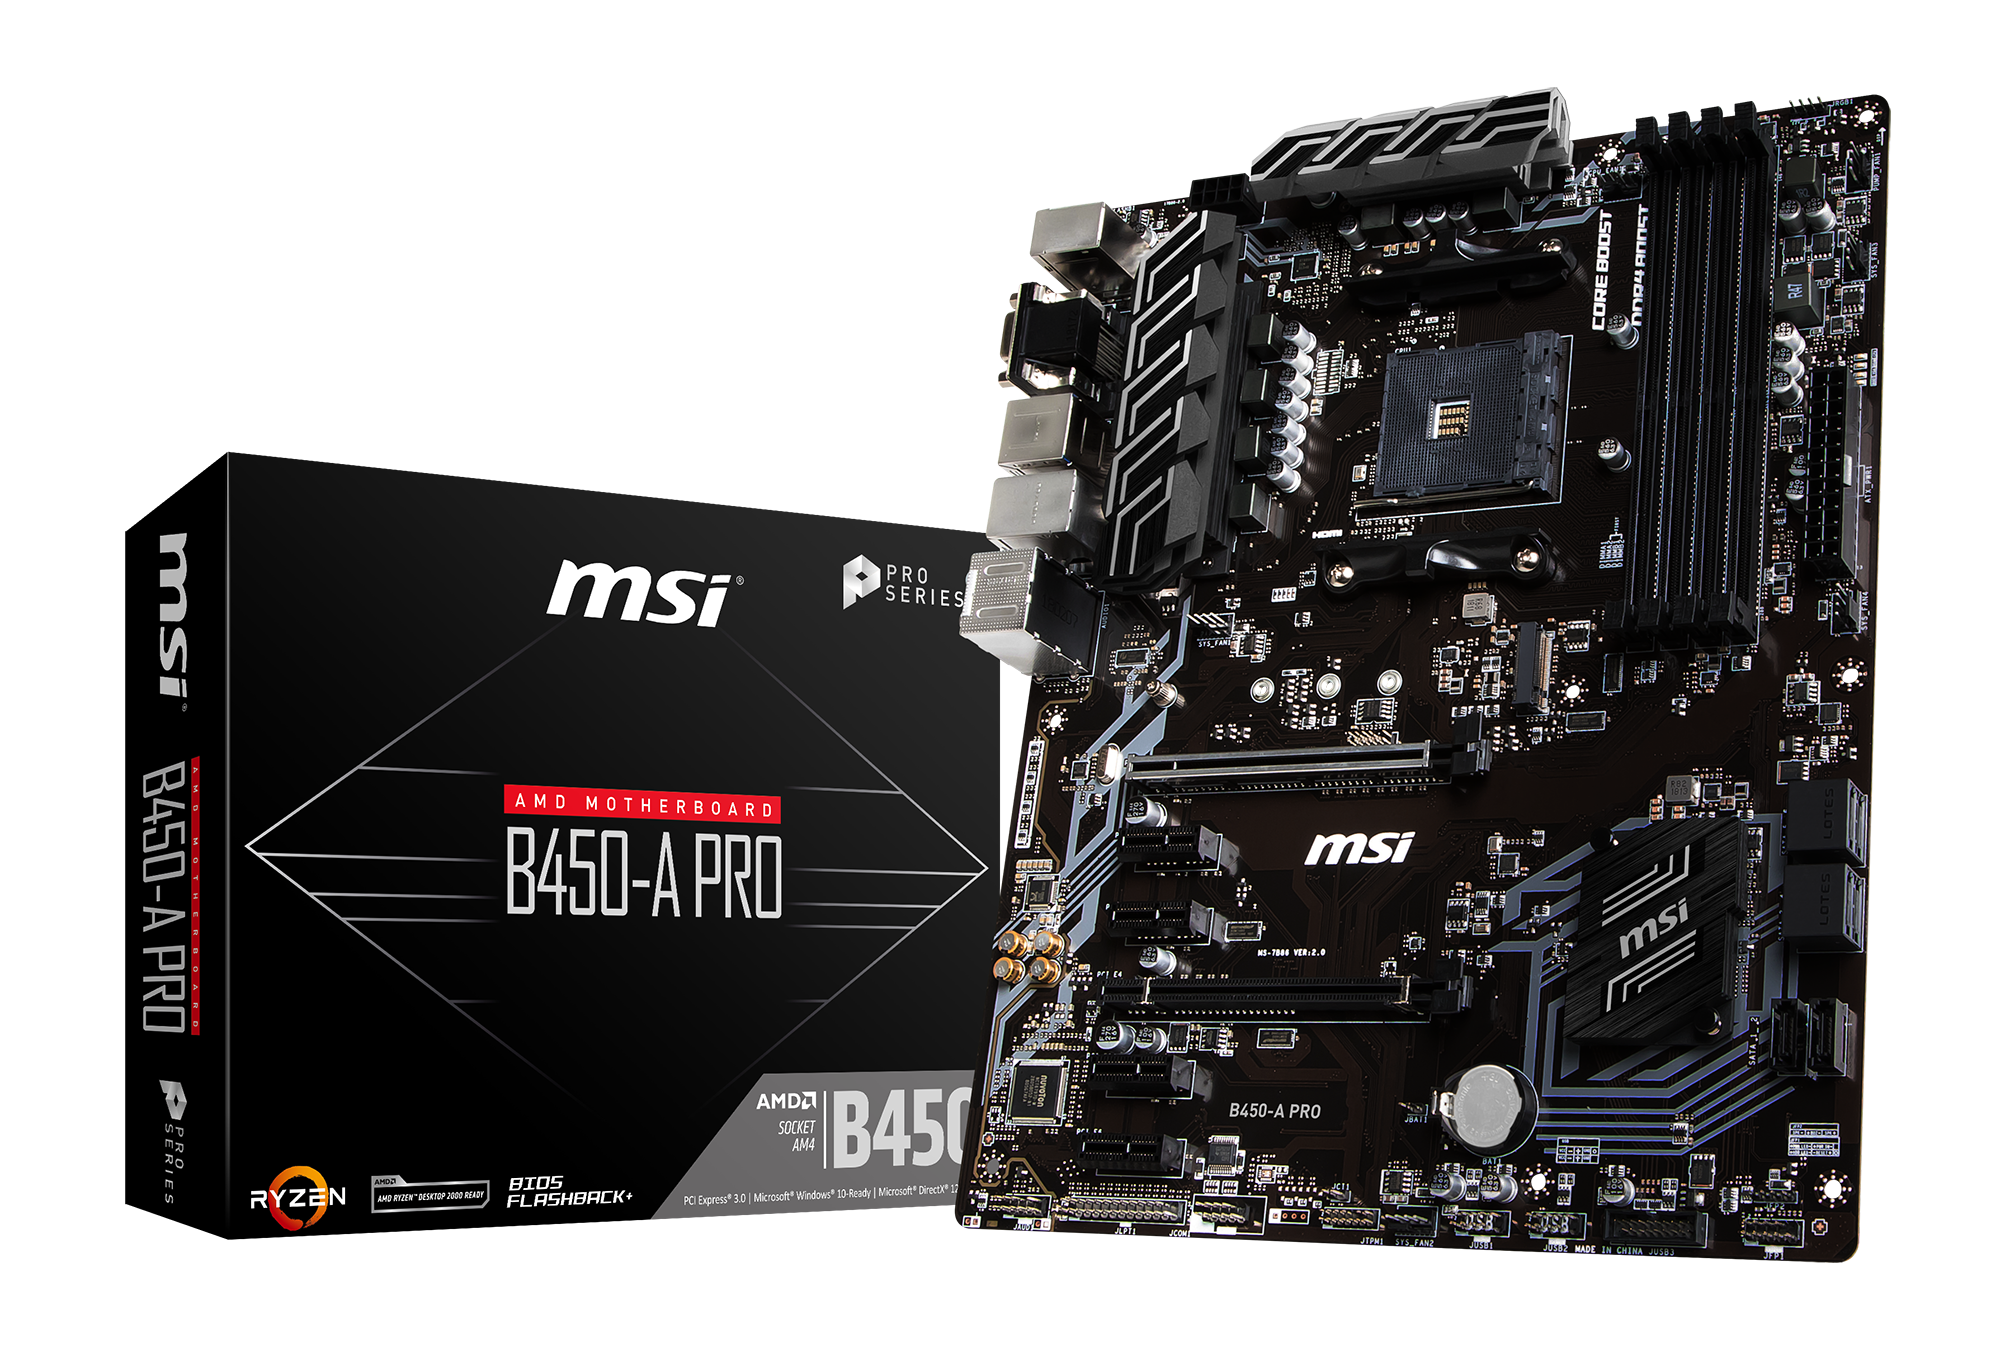 MSI B450-A PRO - Motherboard - ATX - Socket AM4 - AMD B450 - USB 3.1 - Gb LAN - Onboard-Grafik (CPU erforderlich) HD Audio (8-Kanal)